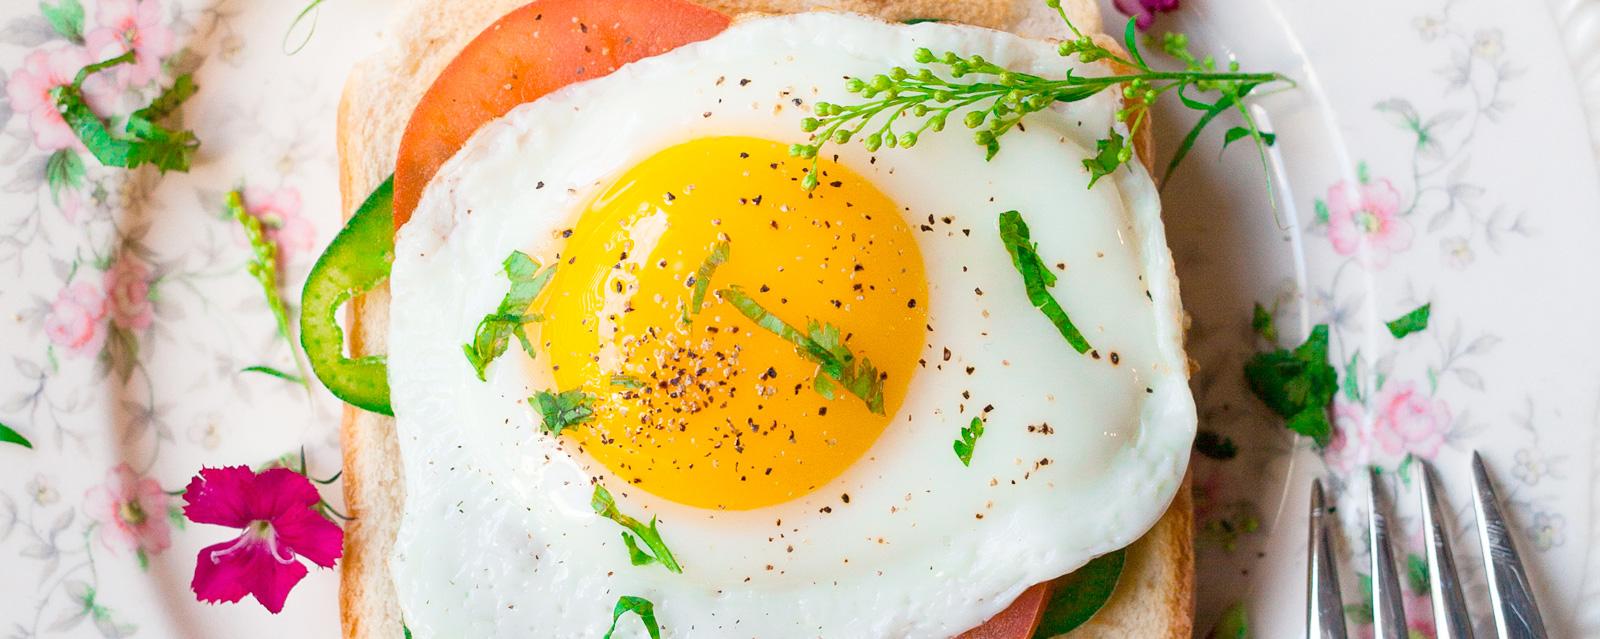 Fama del huevo